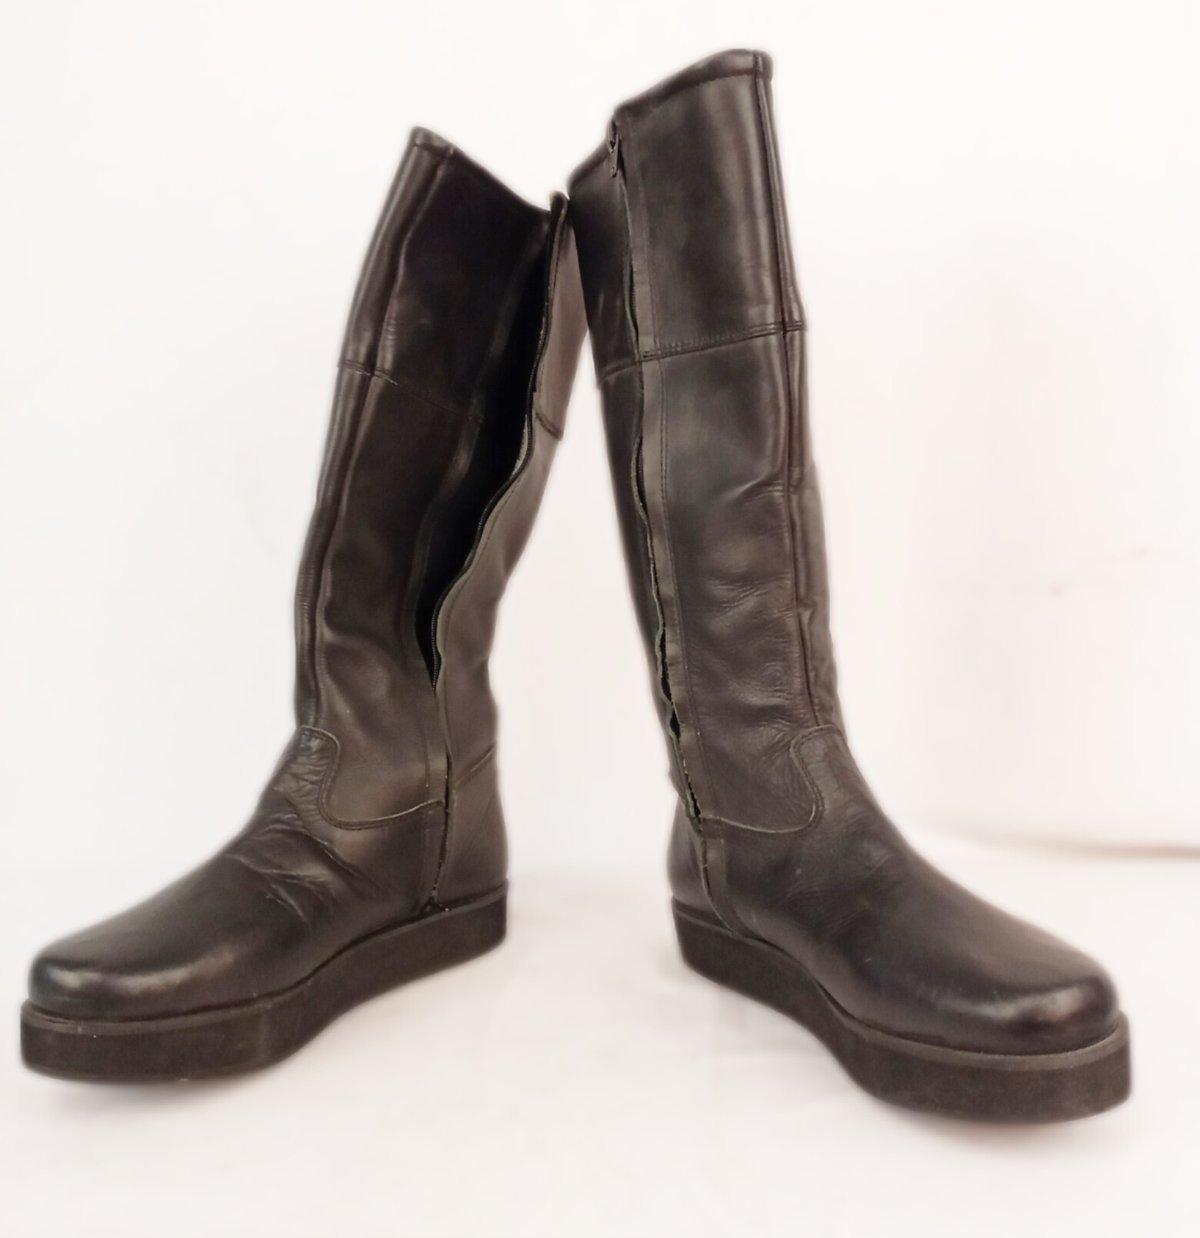 Image of #15 - B Grade from Stock - Shoe Size EU 45